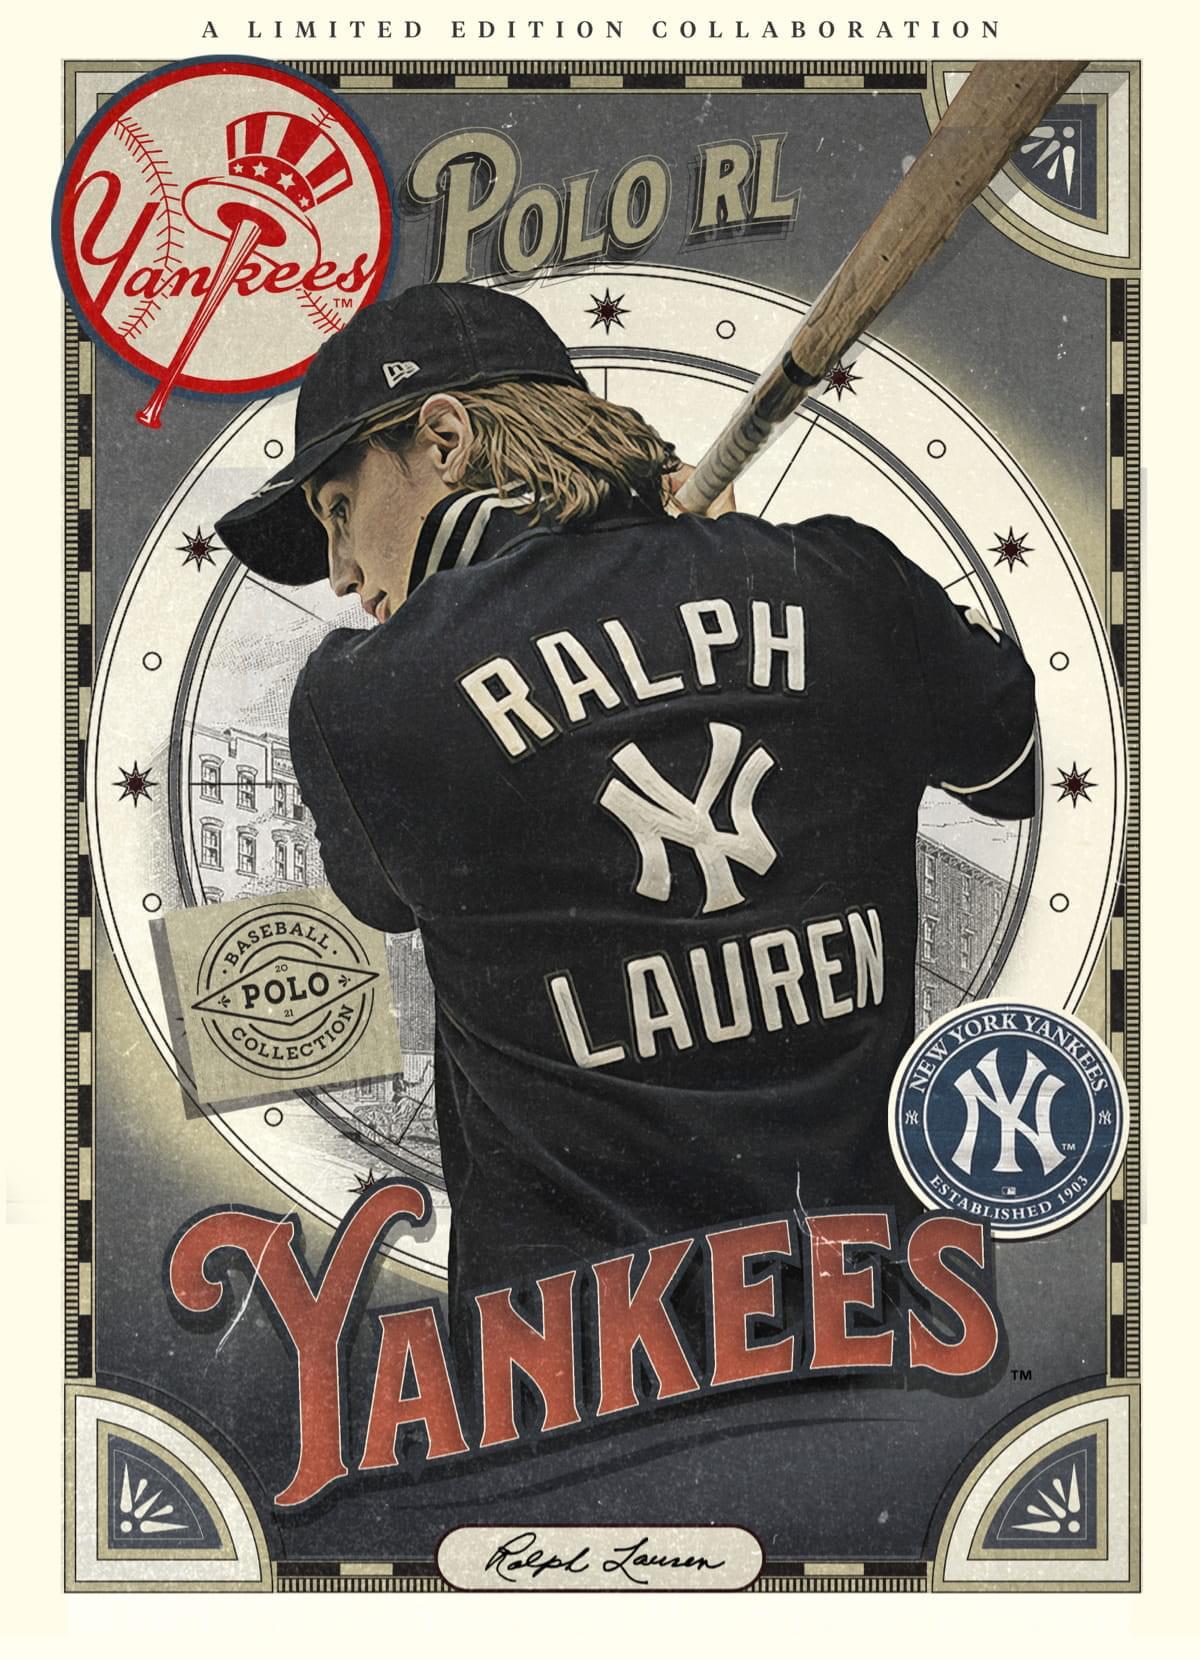 A LIMITED EDITION COLLABORATION Ralph Lauren ヤンキース トレーディングカードのイラスト